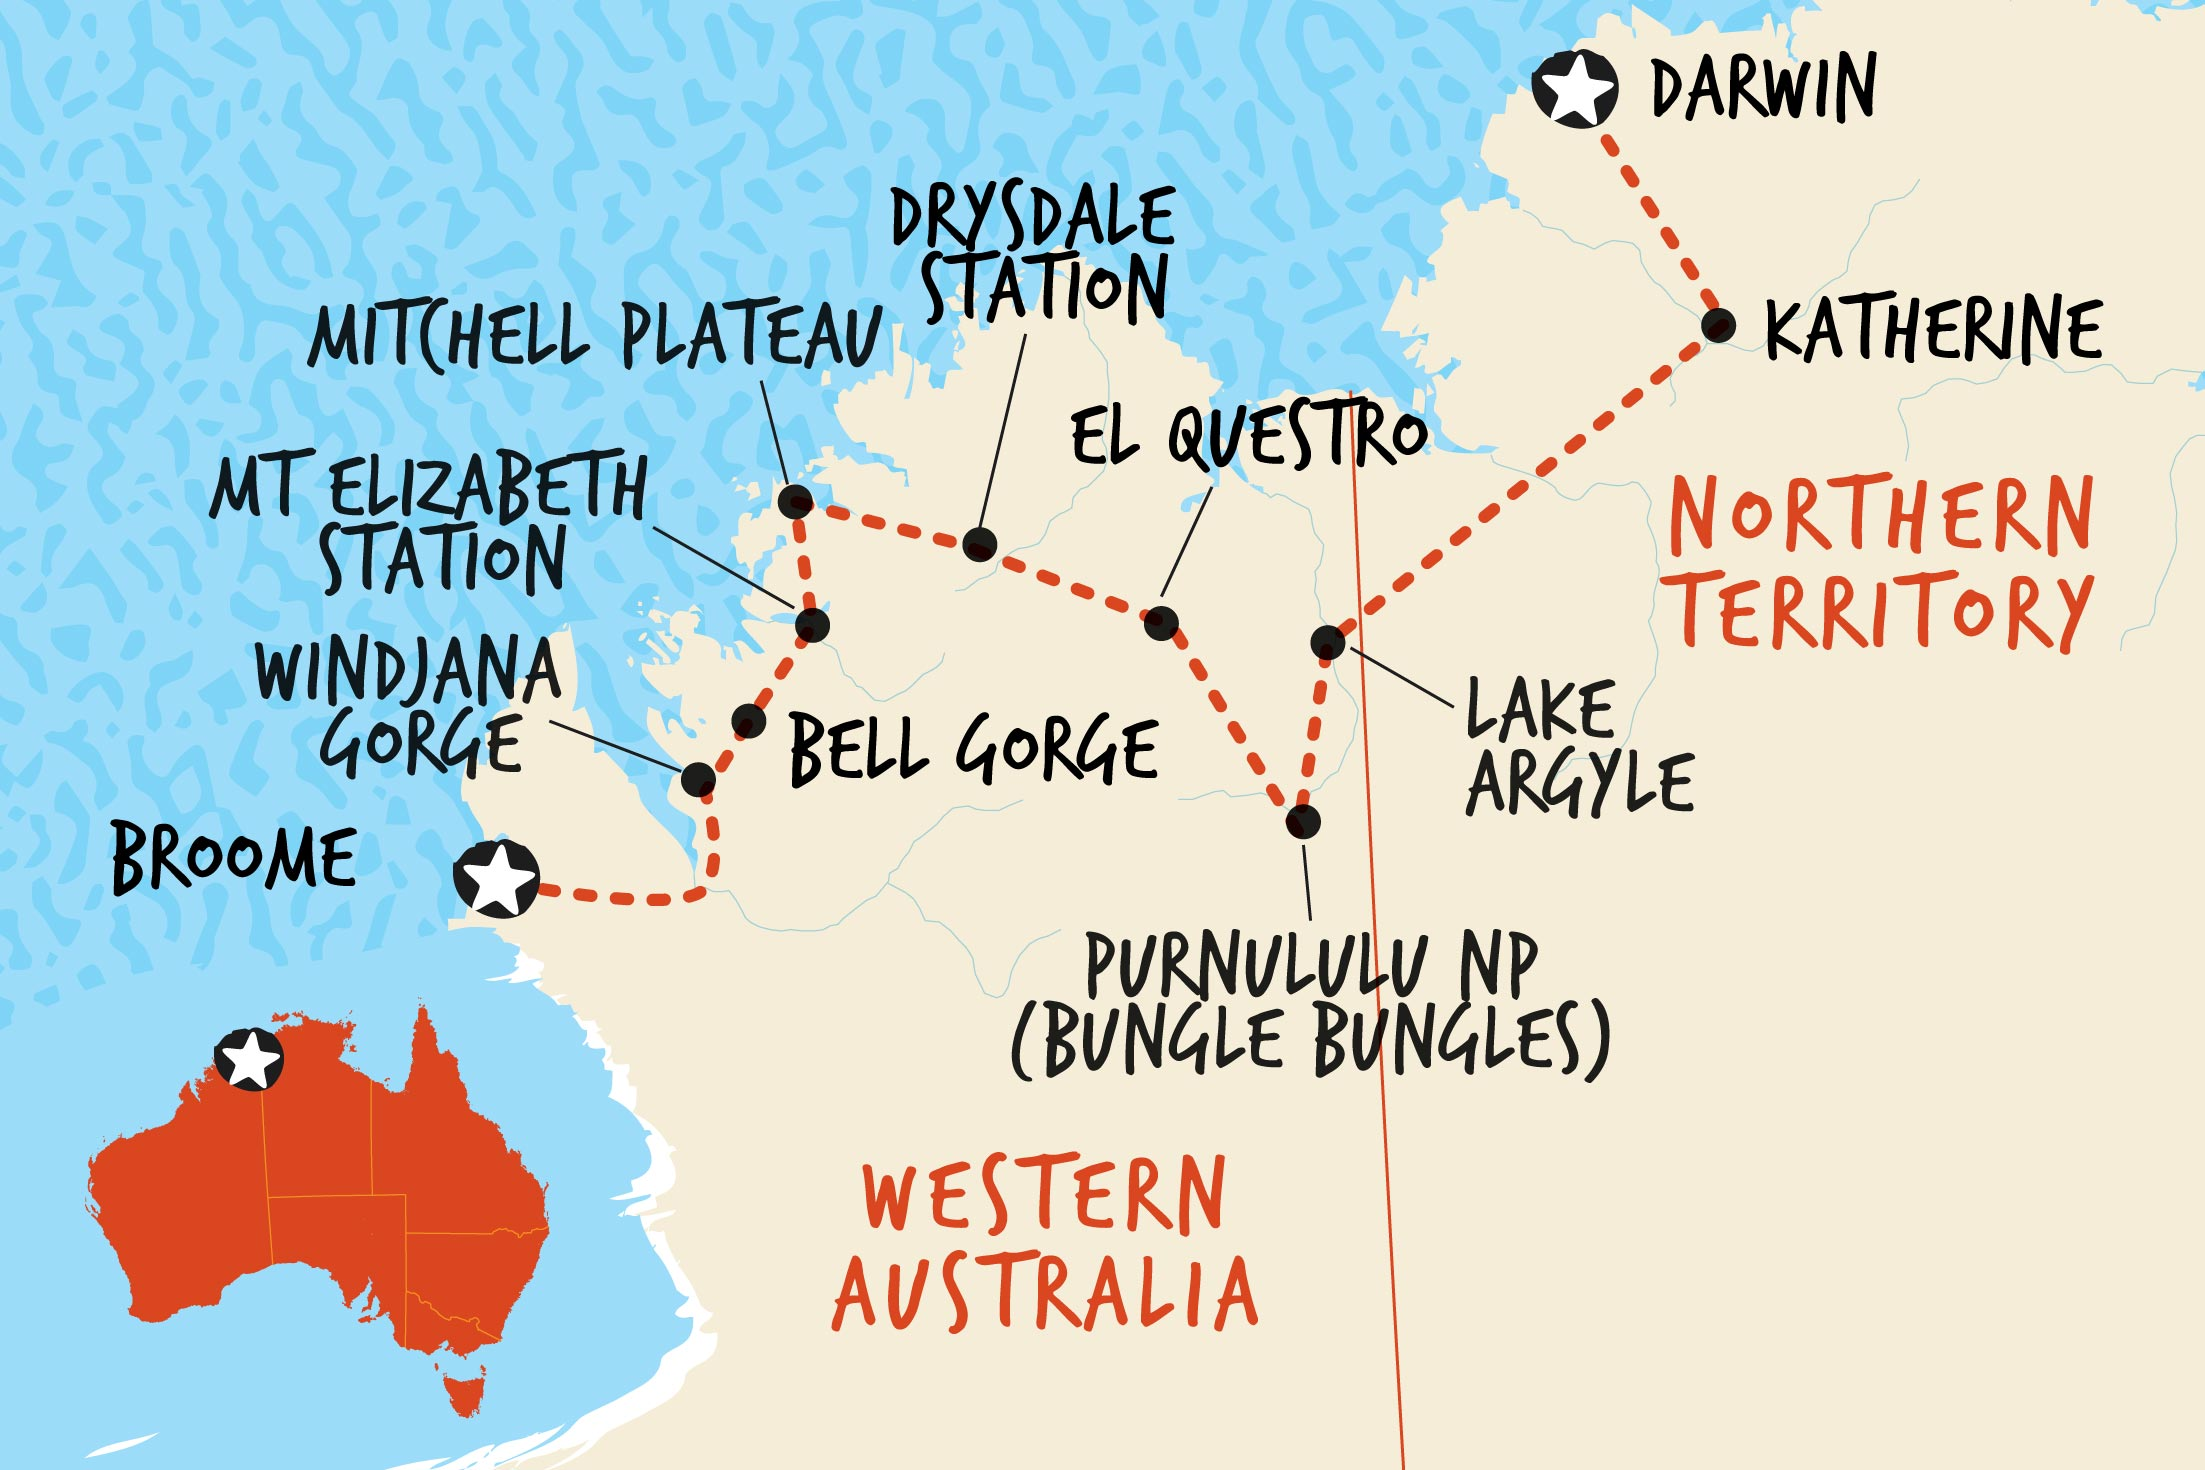 Map of Kimberley Trail Darwin to Broome  including Australia